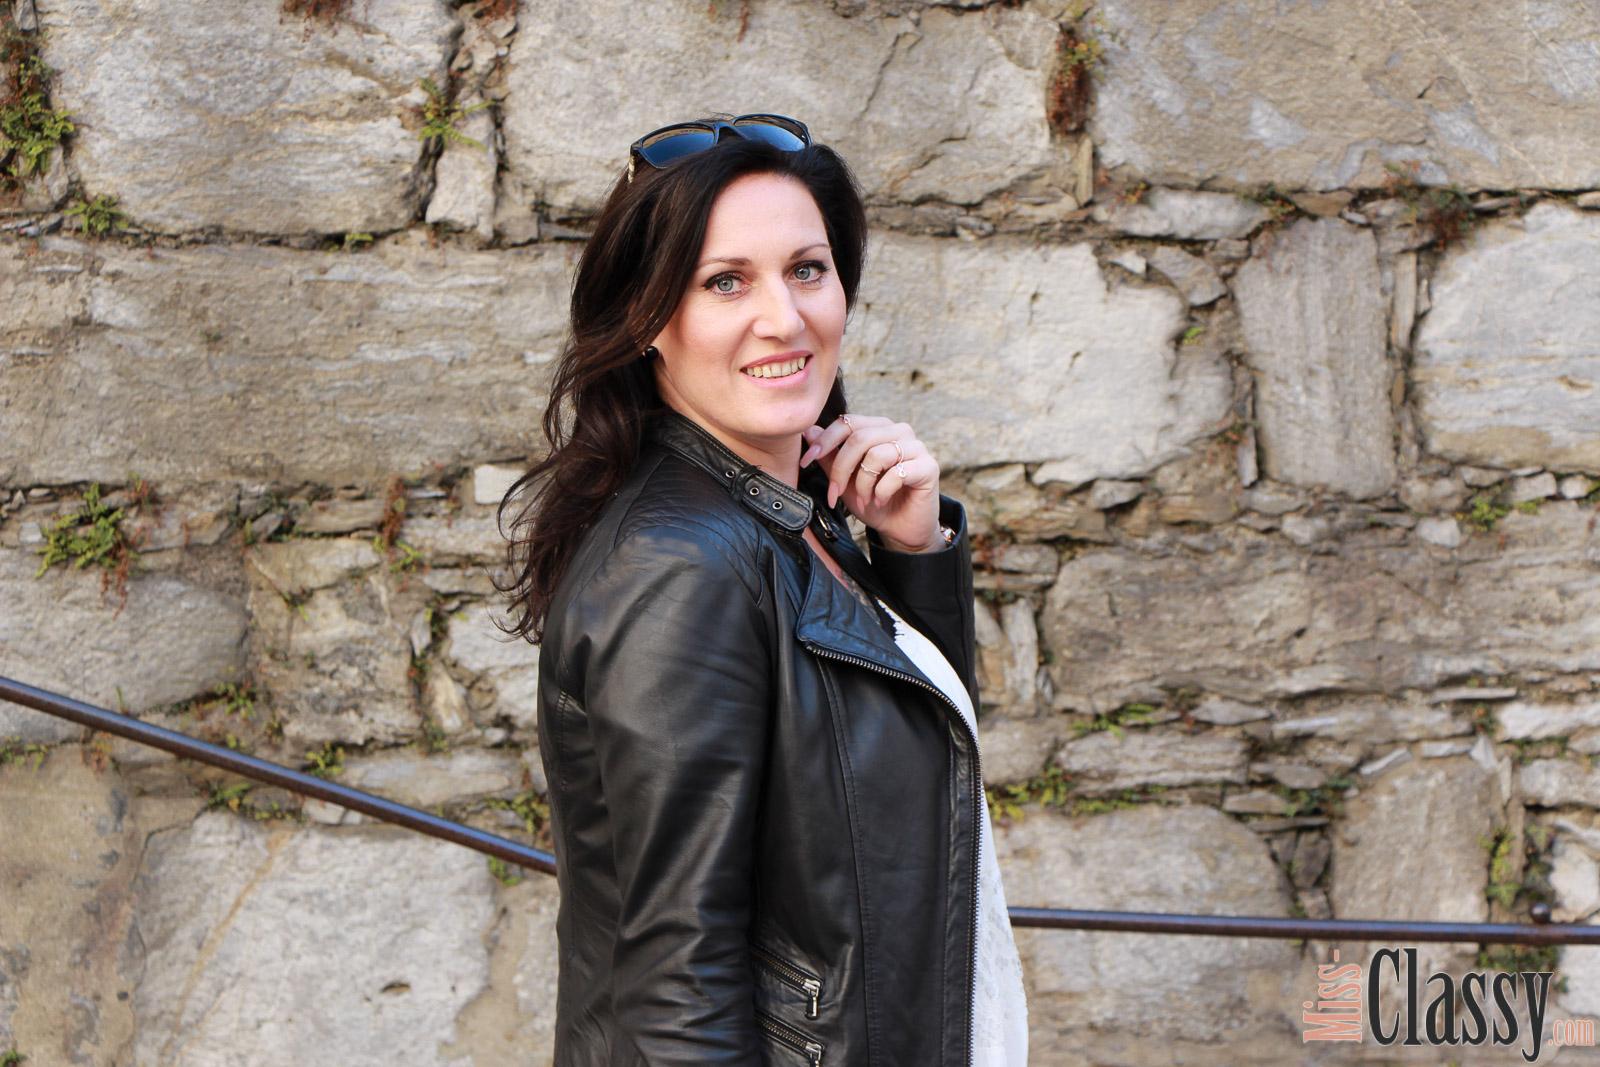 OUTFIT Weisses Kleid mit Spitze - Mein Outfit für den Bloggerbrunch, Miss Classy, miss-classy.com, Fashionblog, Fashionblogger, Fashionblog Graz, Lifestyleblog Graz, Graz, Steiermark, Österreich, classy, beclassy, classy Fashion, weisses Spitzenkleid, weisses Kleid mit Spitze, Guess, Lederjacke, Lederjacke Hallhuber, Lederleggings, Sonnenbrille Burberry, Selma Michael Kors, Stiefeletten, Bloggertreffen, Bloggerbrunch, Cafe Fotter